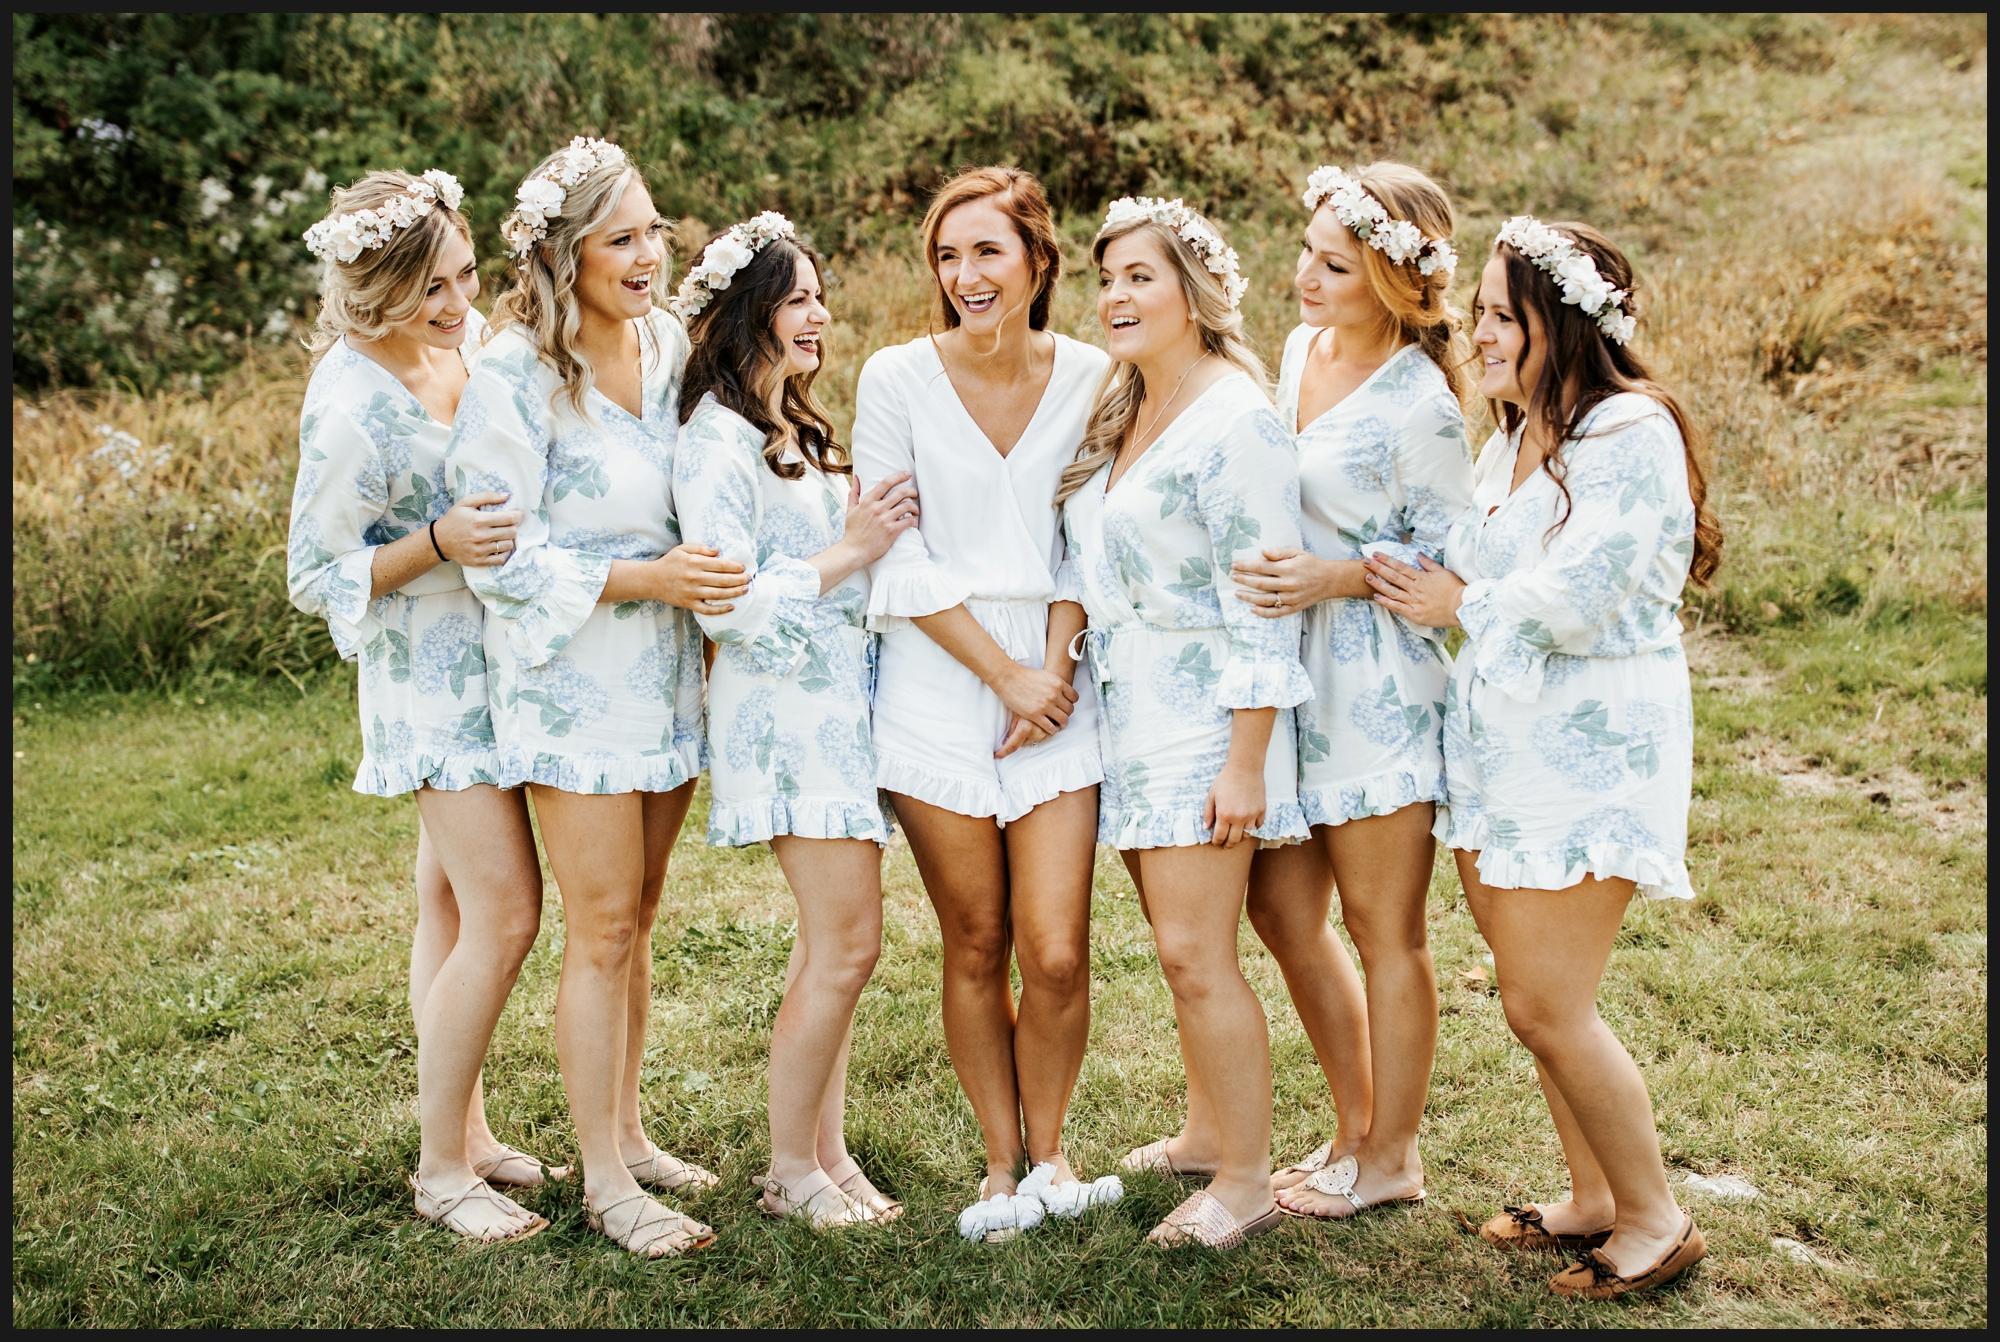 Orlando-Wedding-Photographer-destination-wedding-photographer-florida-wedding-photographer-hawaii-wedding-photographer_0123.jpg